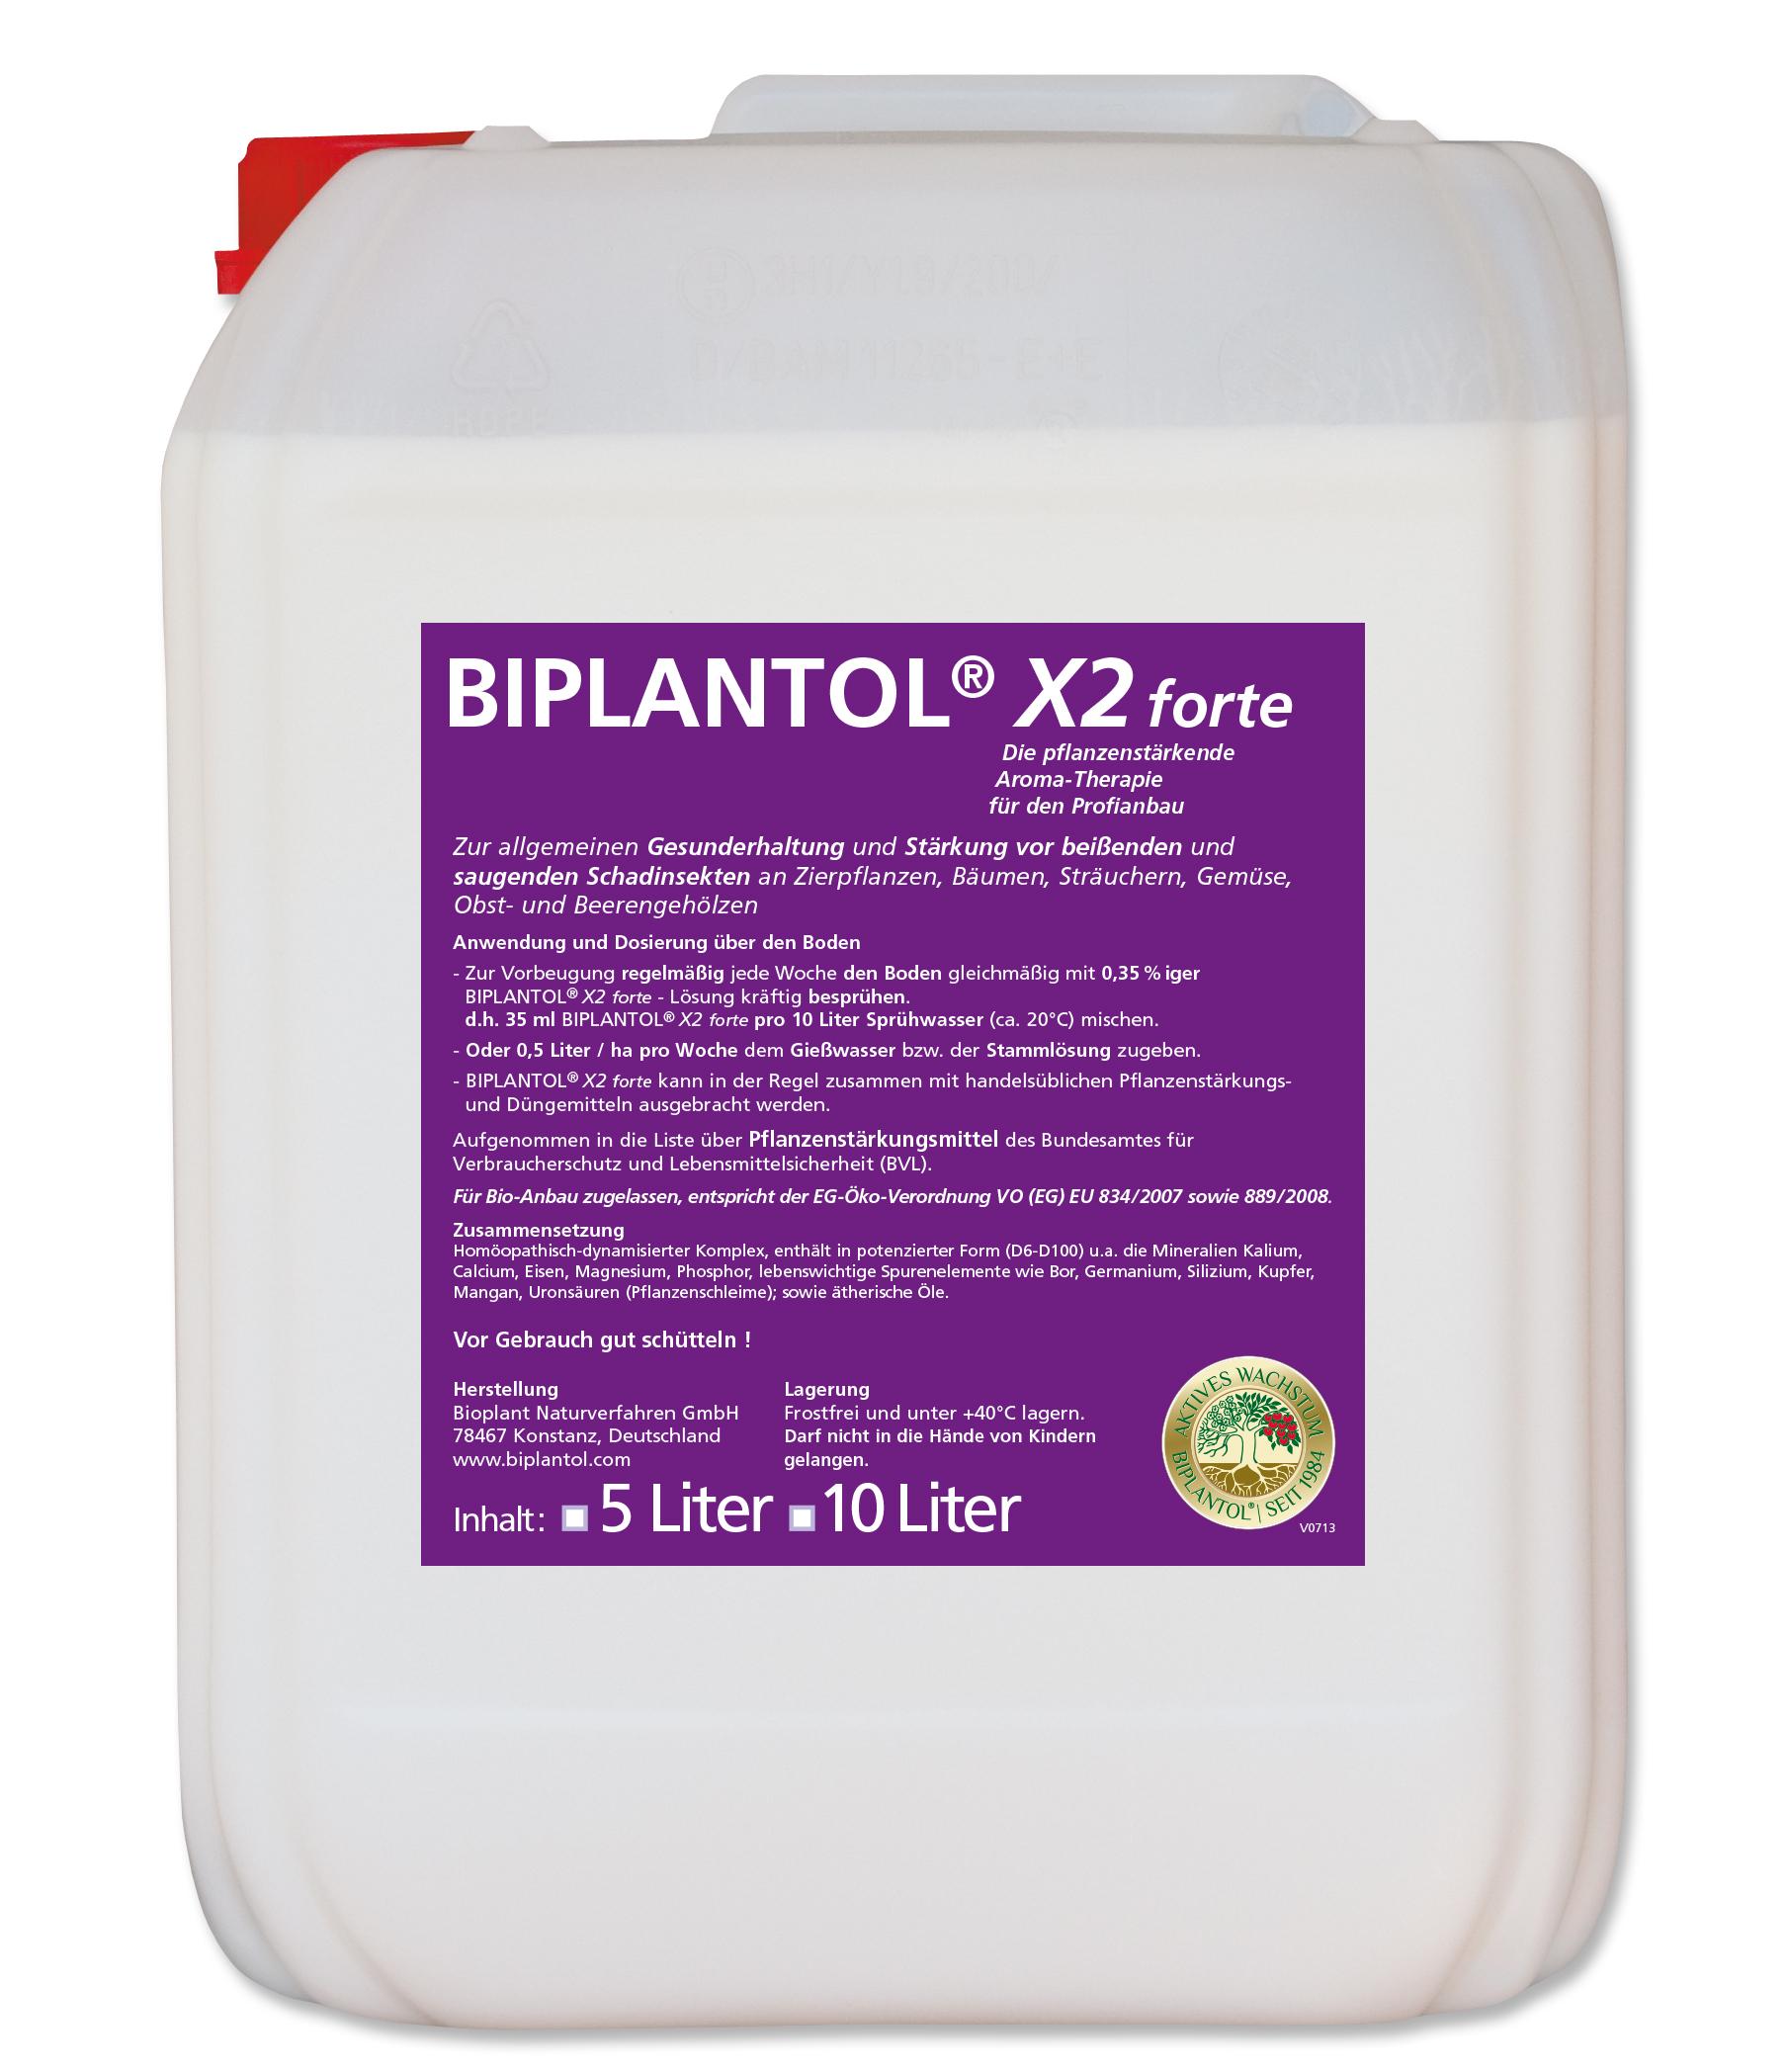 Biplantol® X2 forte